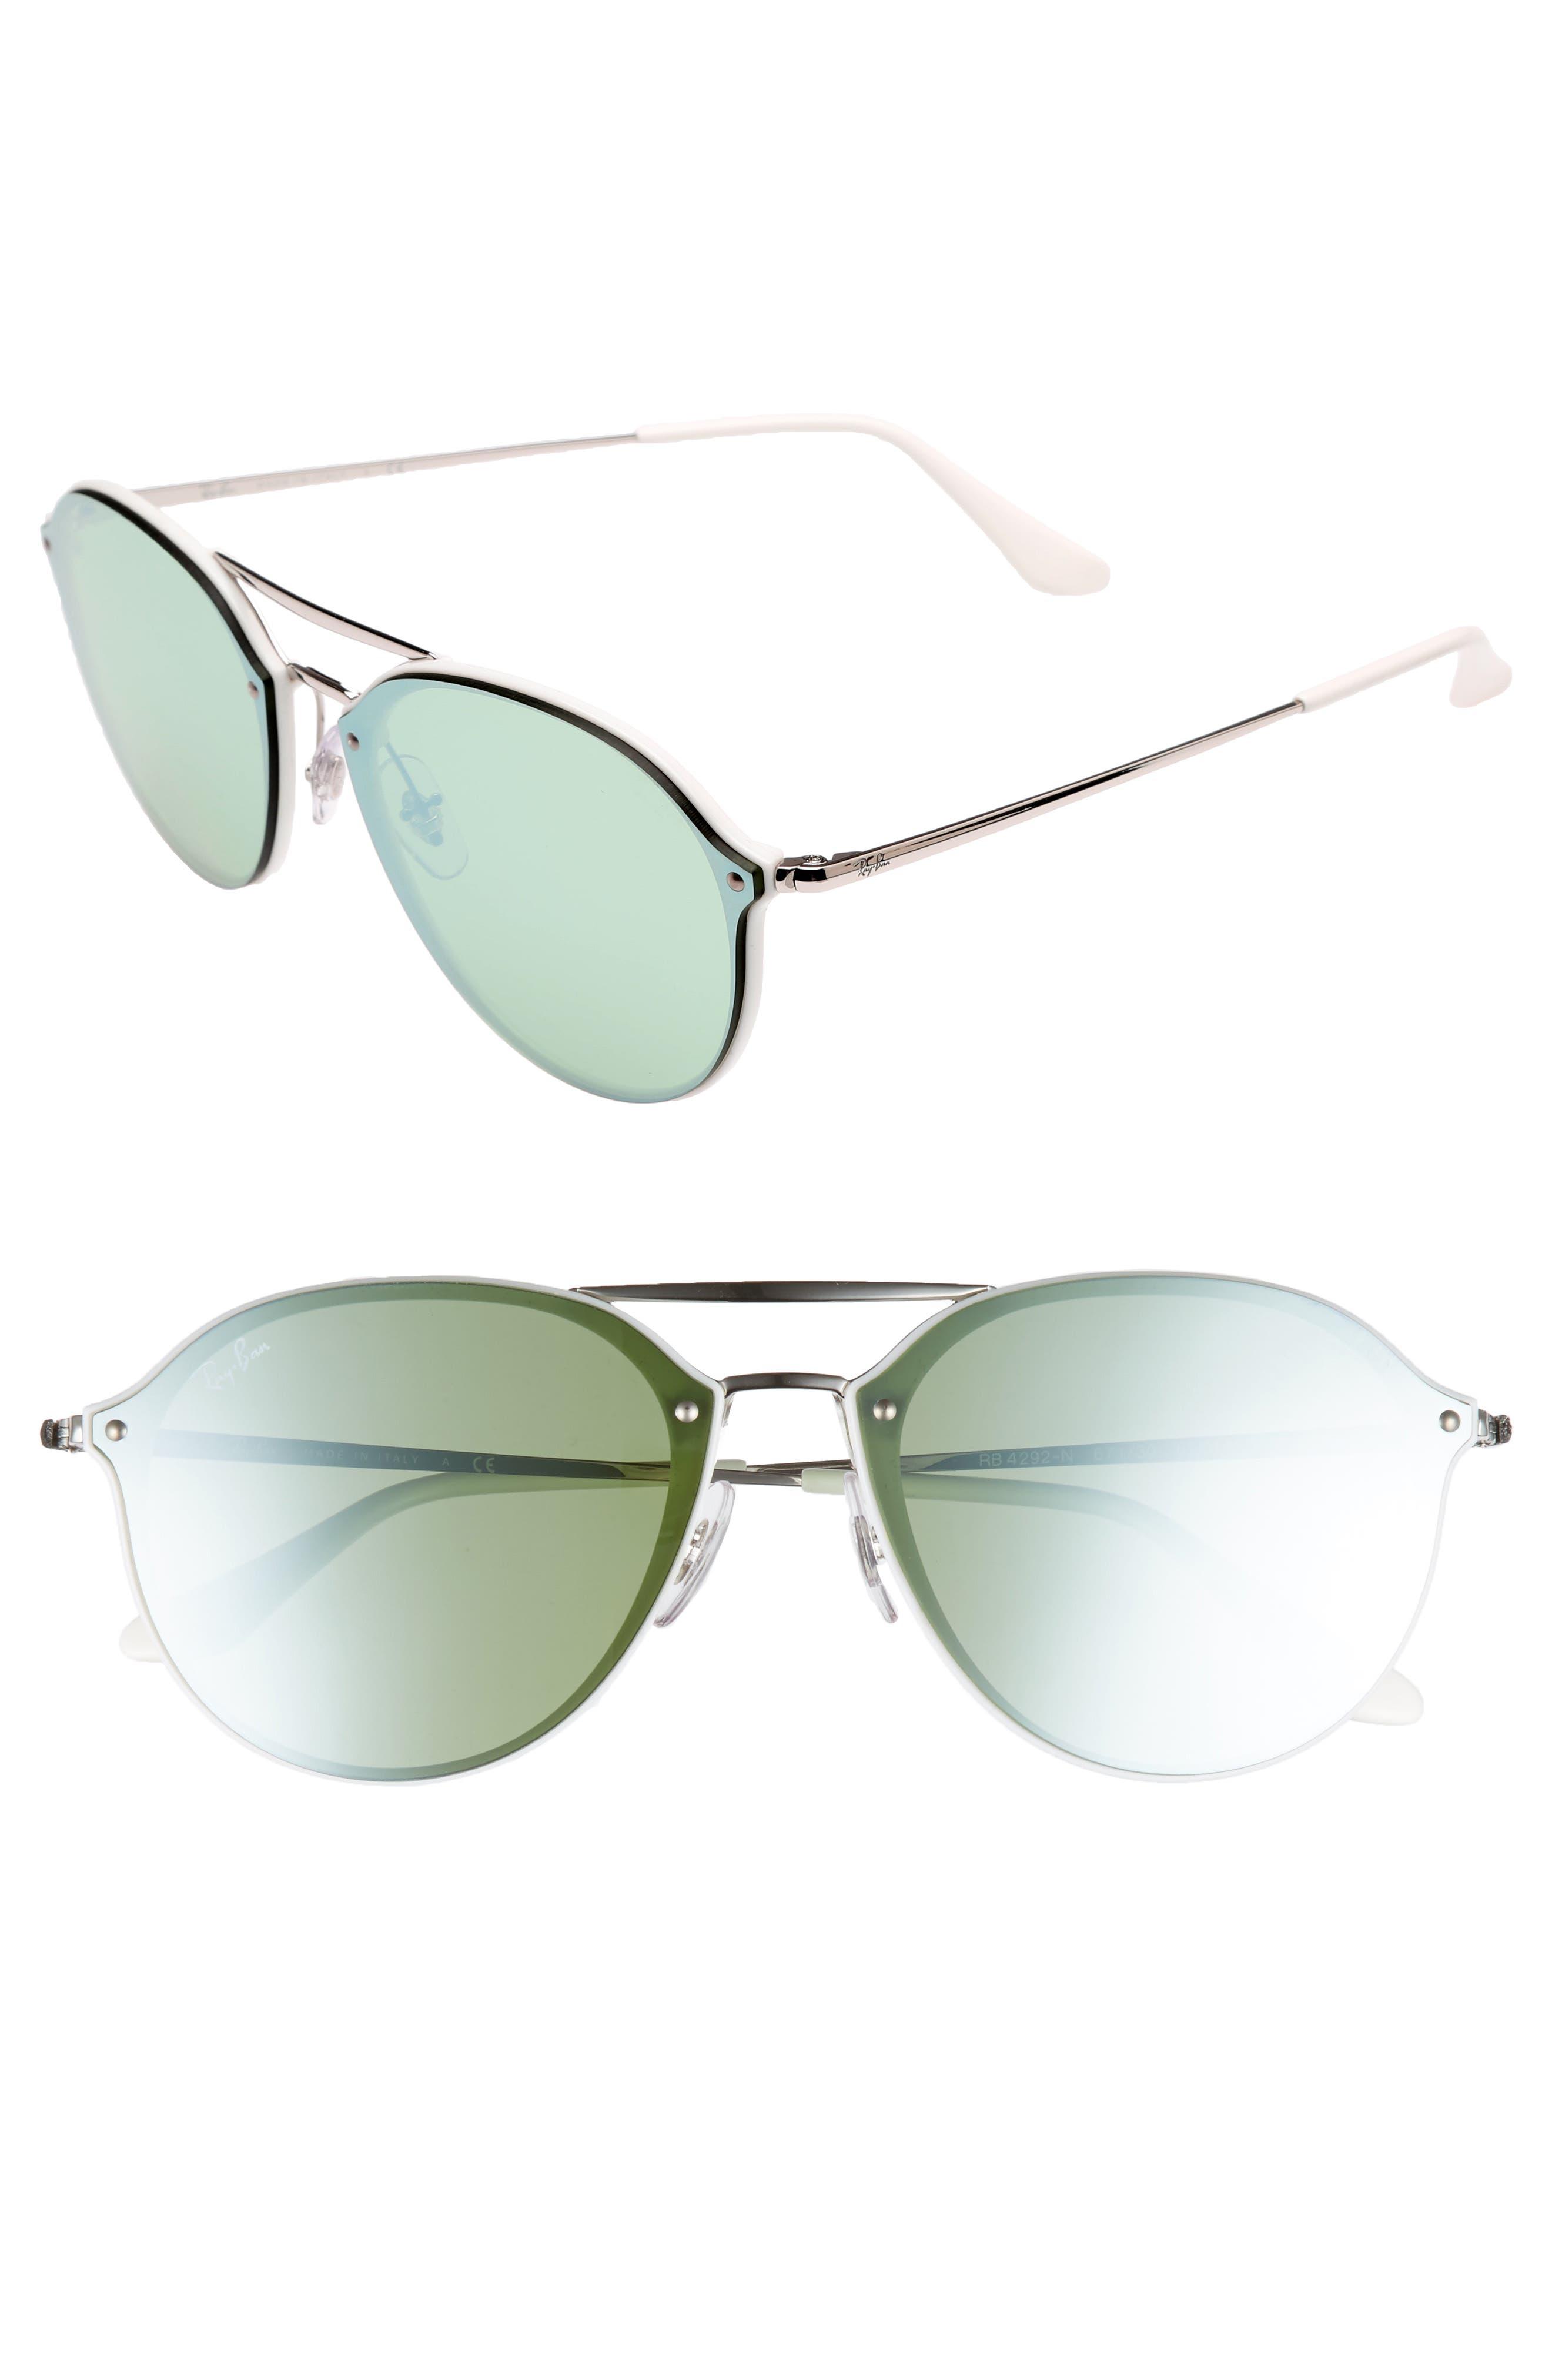 62mm Mirrored Lens Aviator Sunglasses,                         Main,                         color, 100